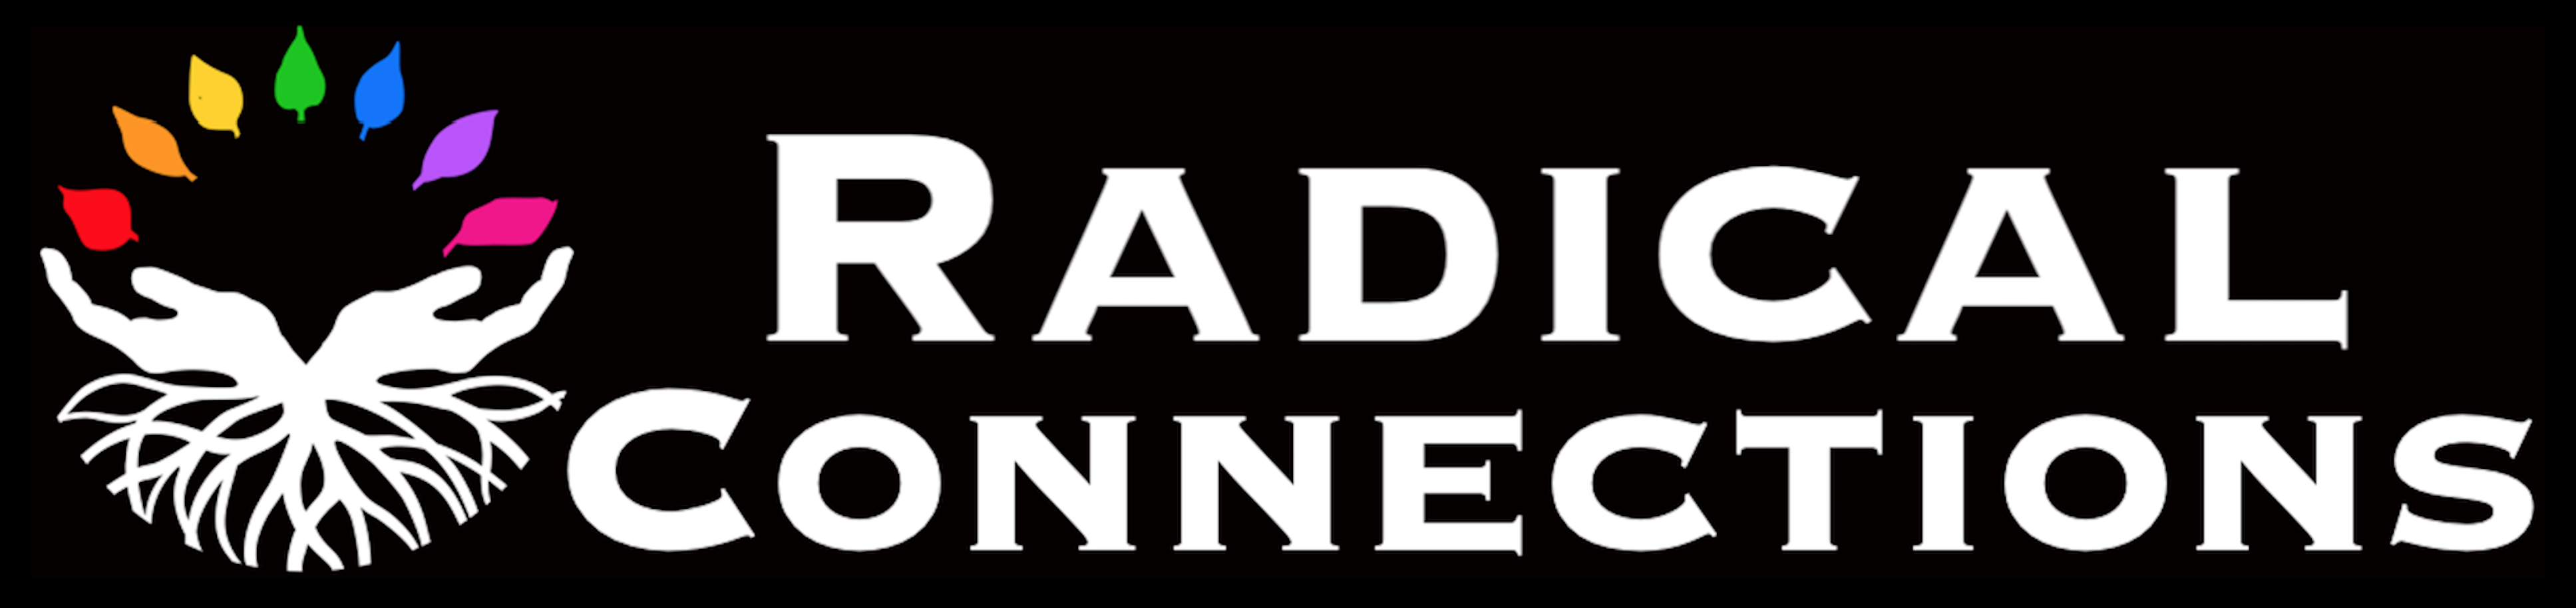 Radical Connections logo block